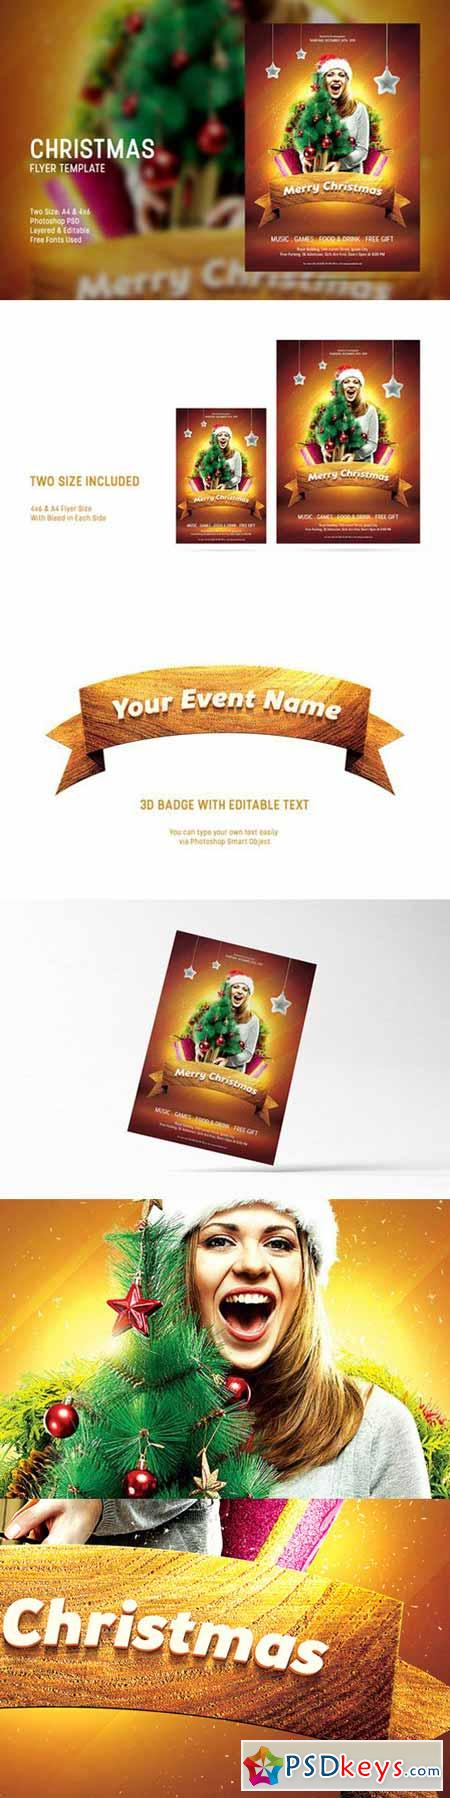 christmas flyer template 425712 photoshop vector christmas flyer template 425712